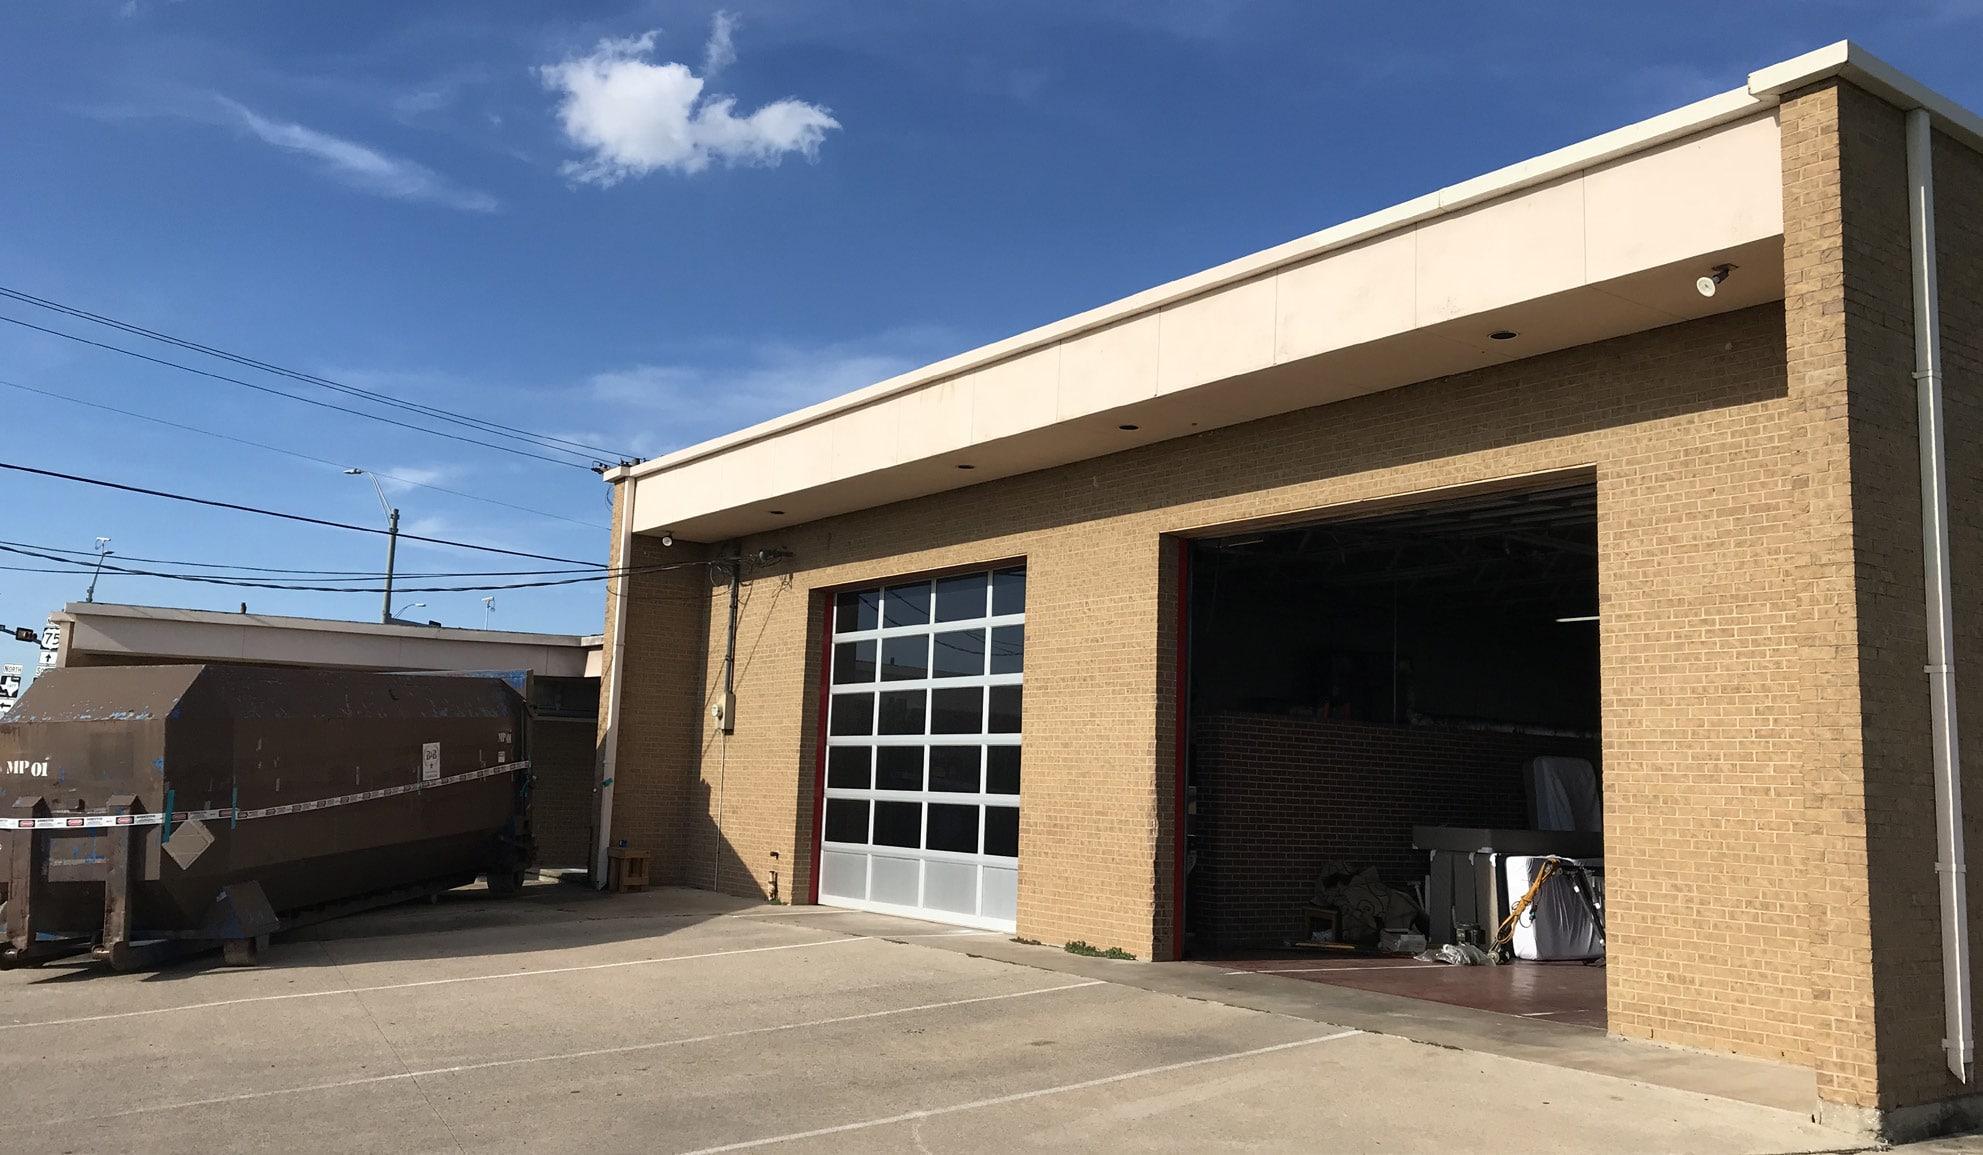 VERTEX Environmental IHBS Sherman Oaks Fire Station, TX, 53454